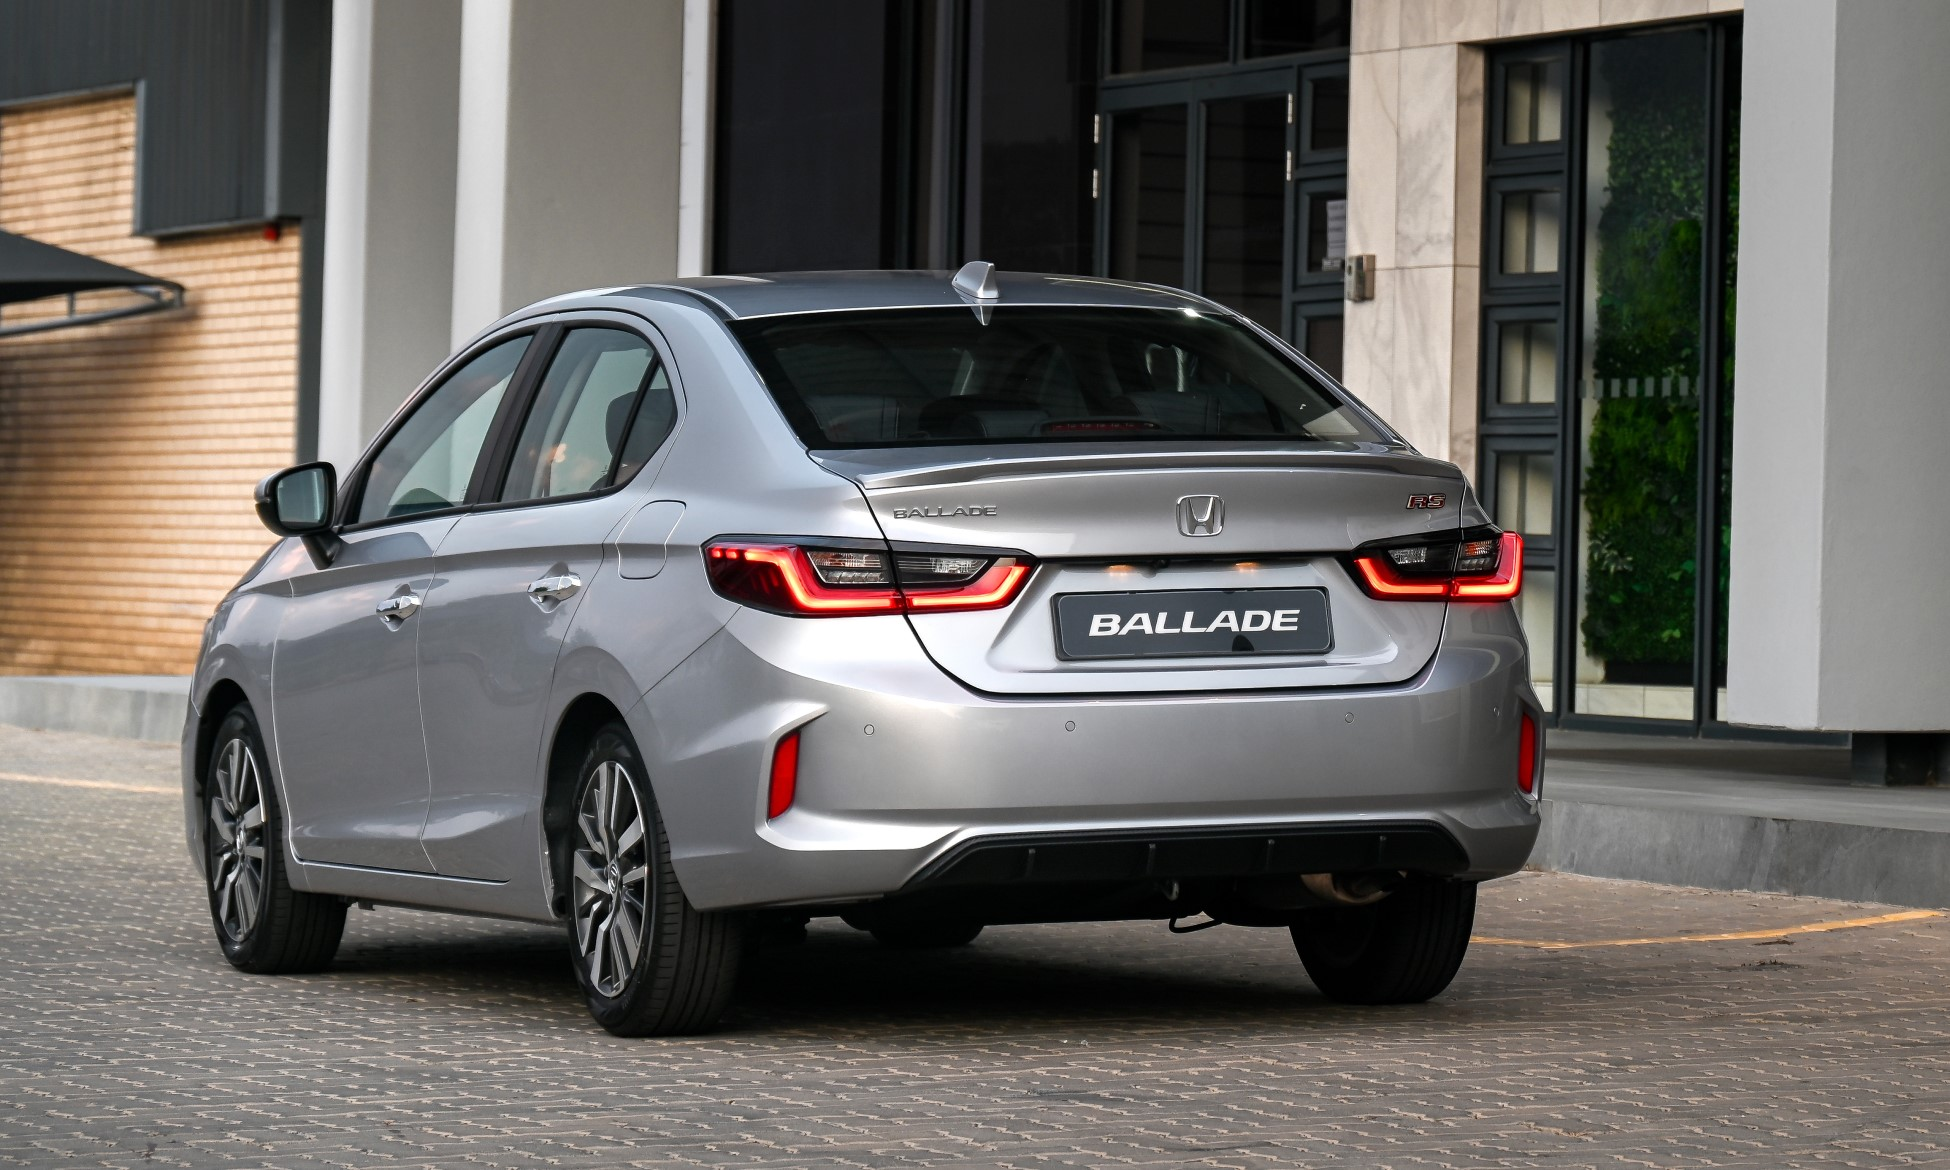 New Honda Ballade rear